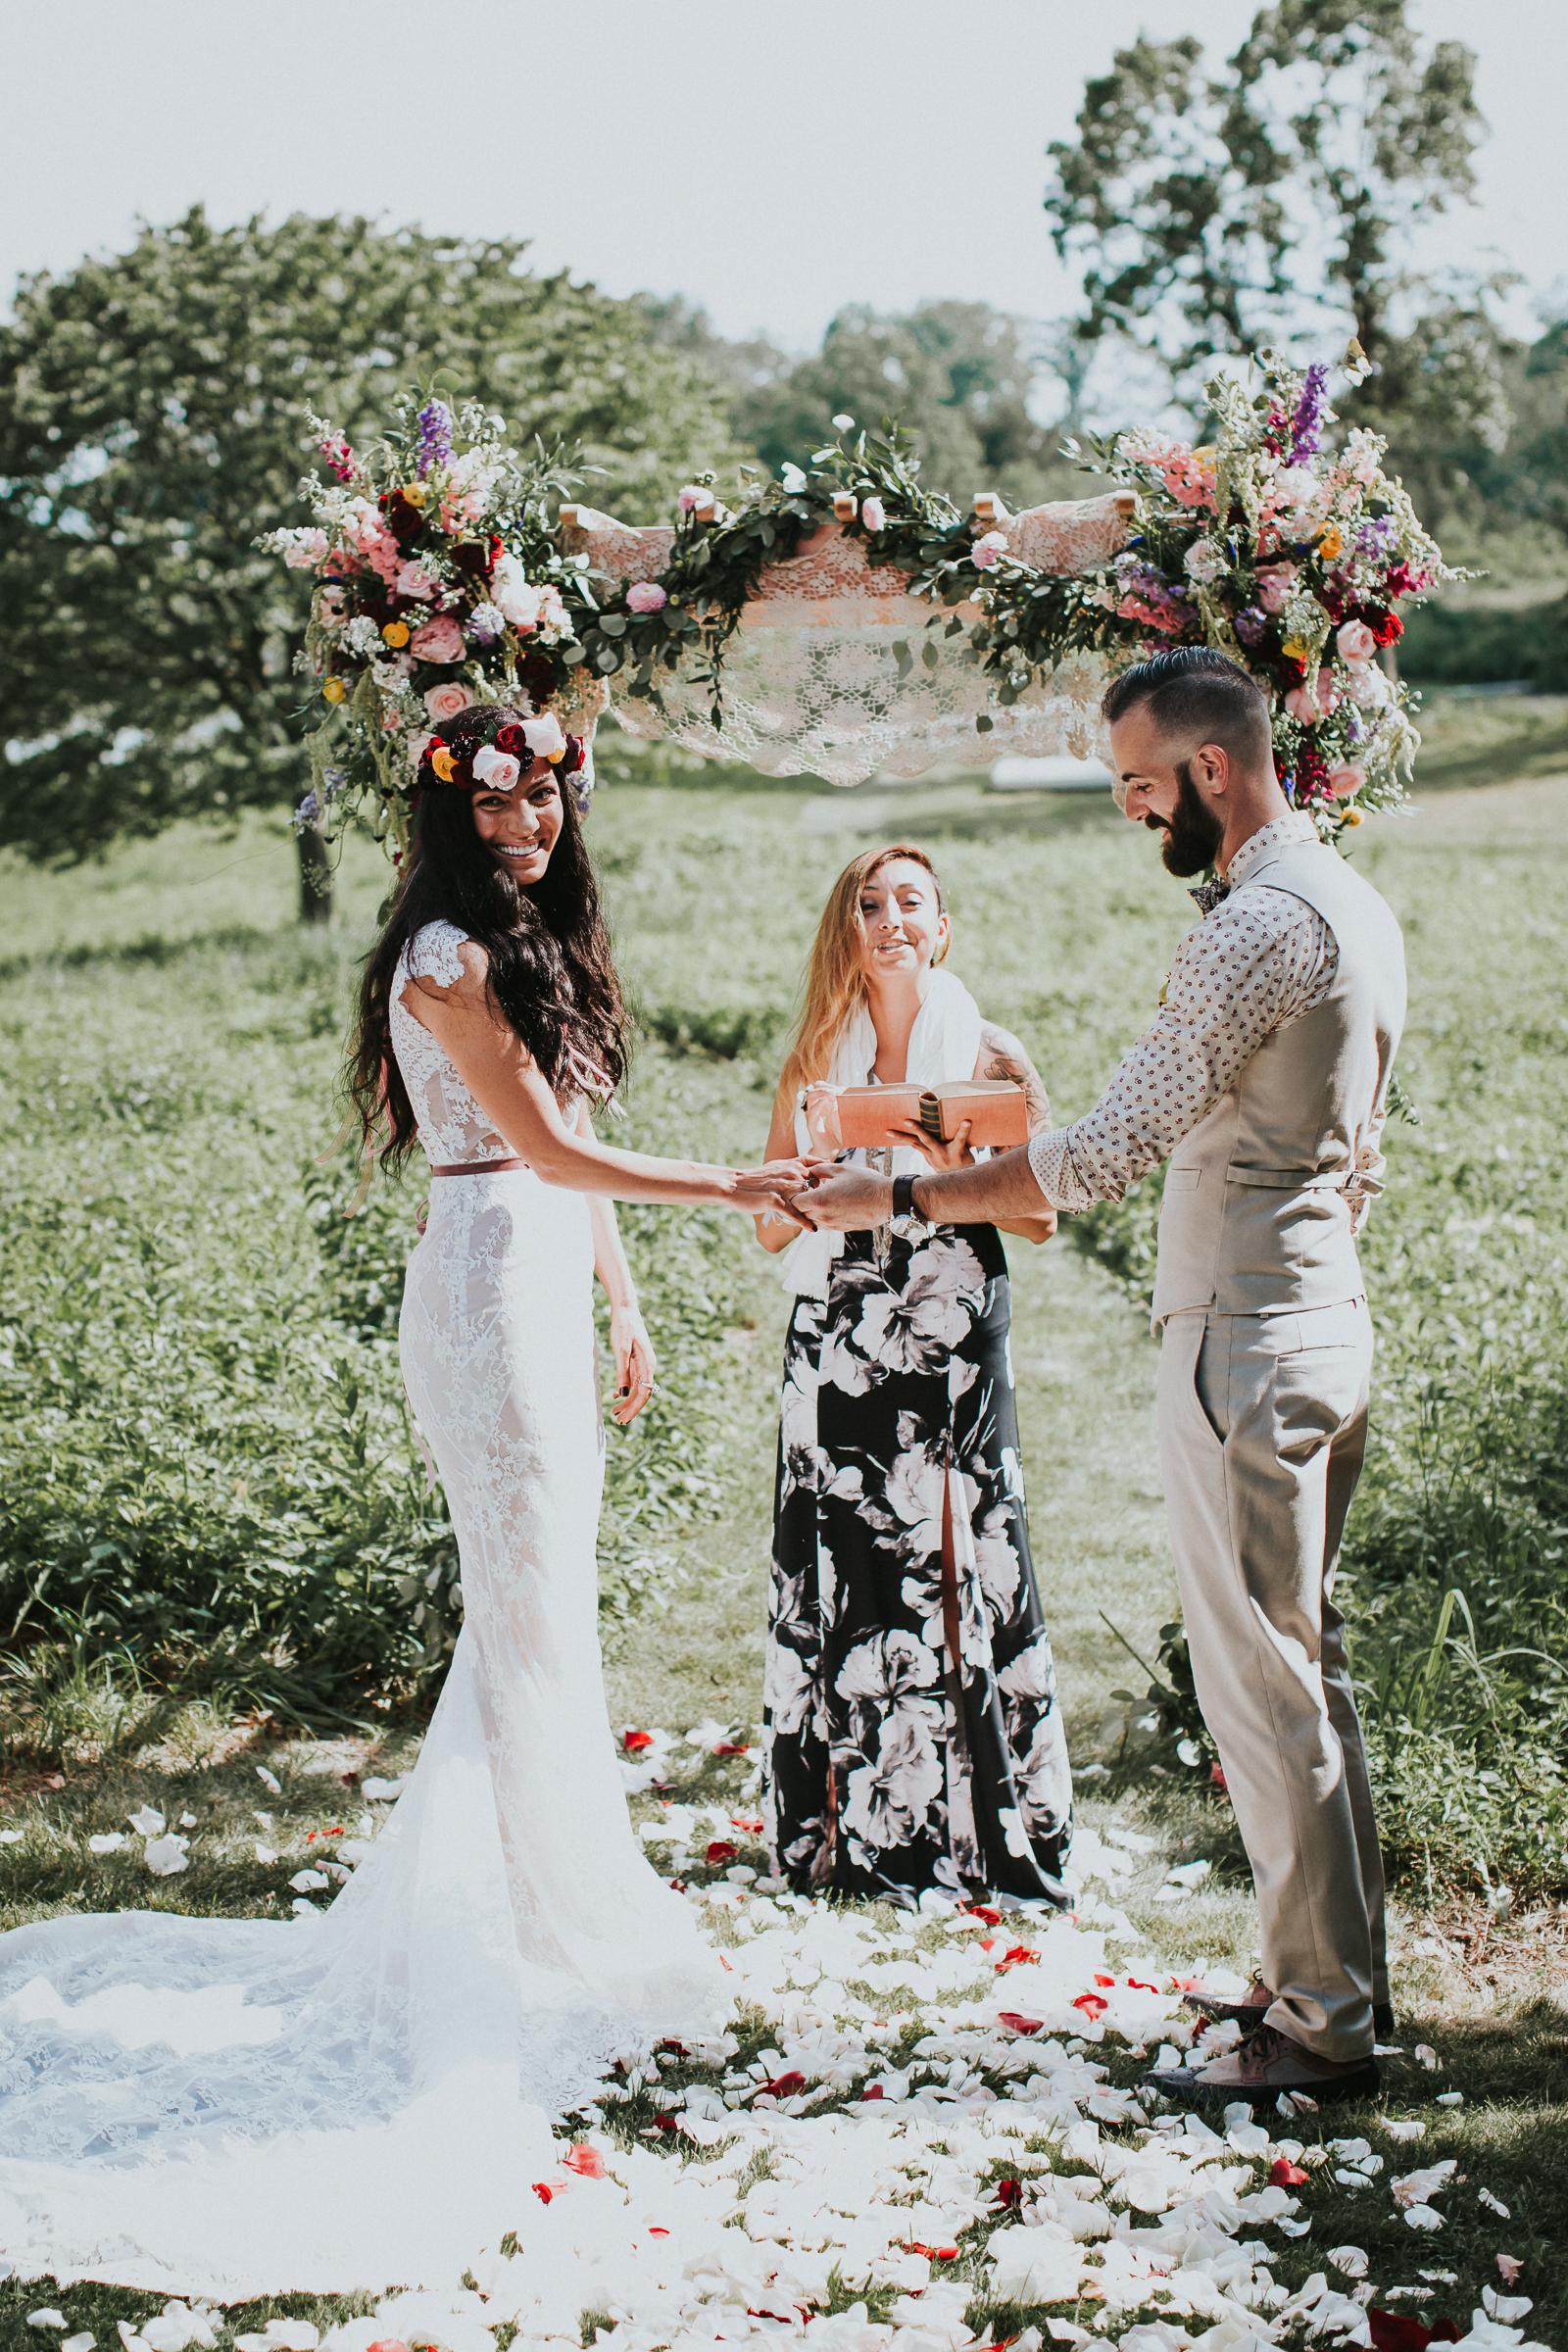 New-York-Documentary-Wedding-Photography-Best-Of-2017-by-Elvira-Kalviste-Photography-61.jpg